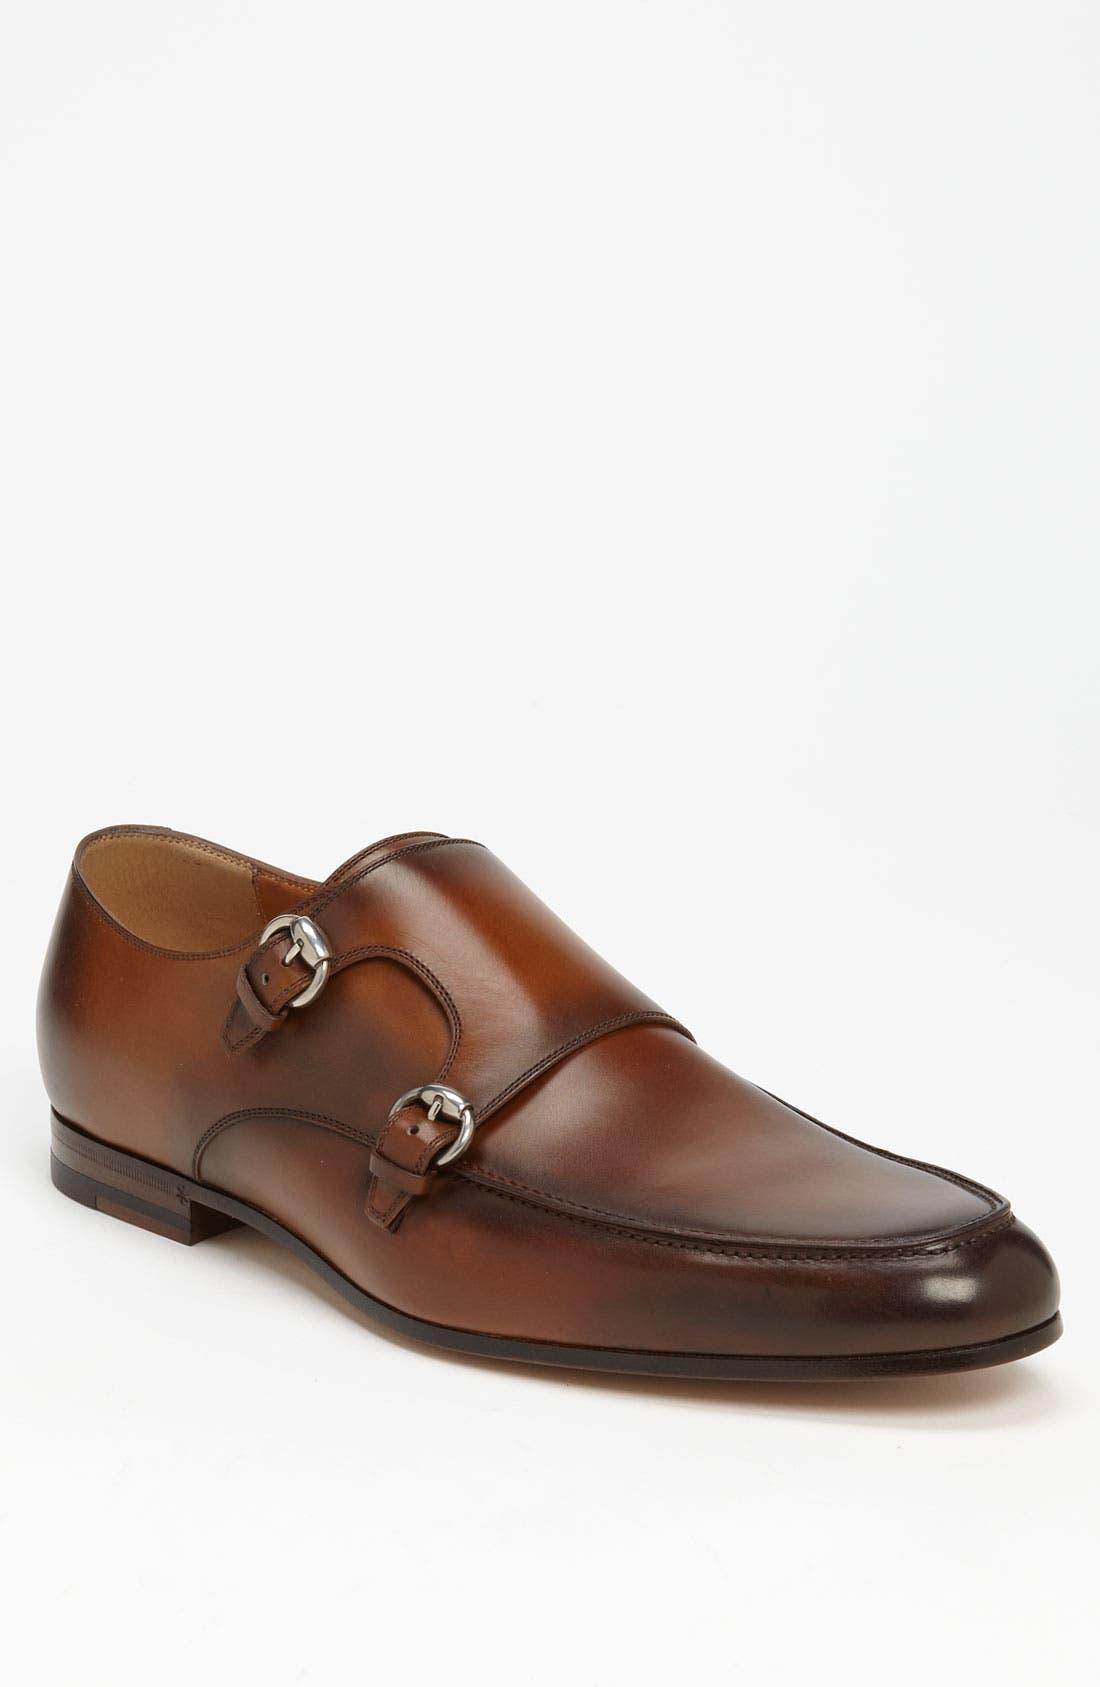 Alternate Image 1 Selected - Gucci 'Bonnard' Monk Strap Shoe